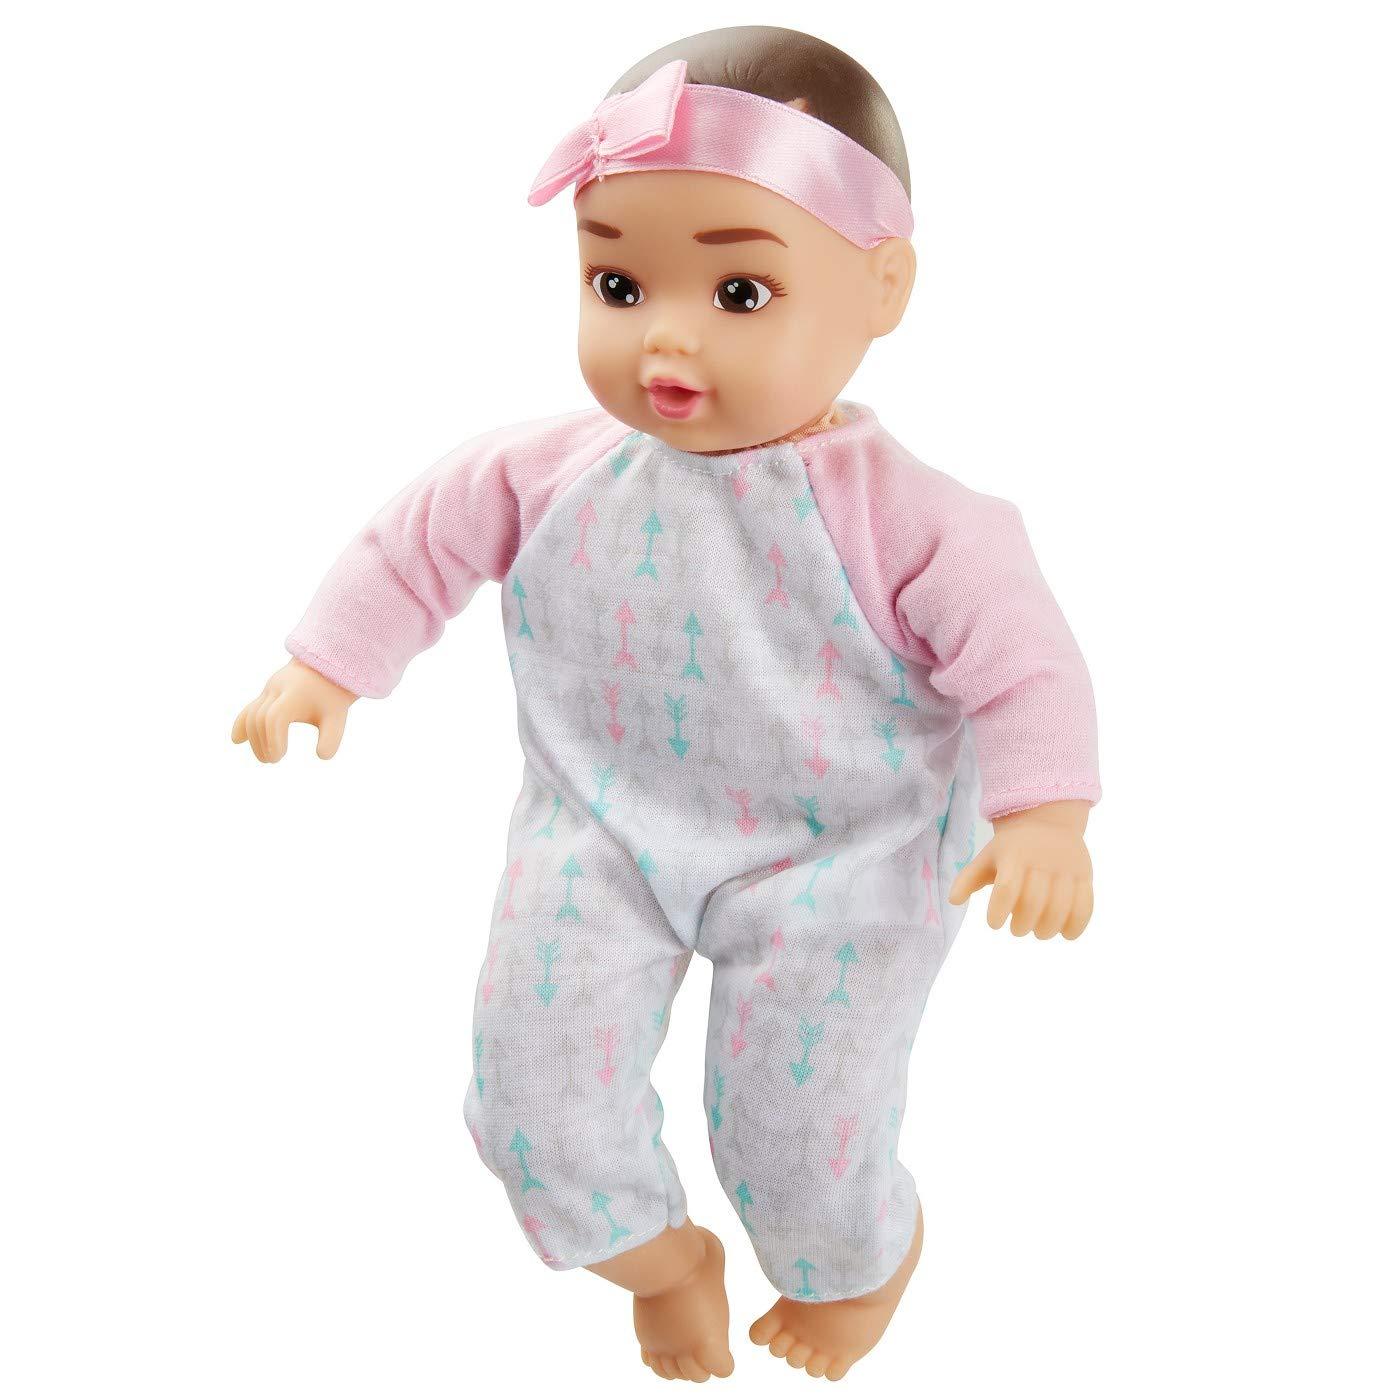 8 Baby Girl Doll Perfectly Cute My Lil Baby Dark Brown Hair